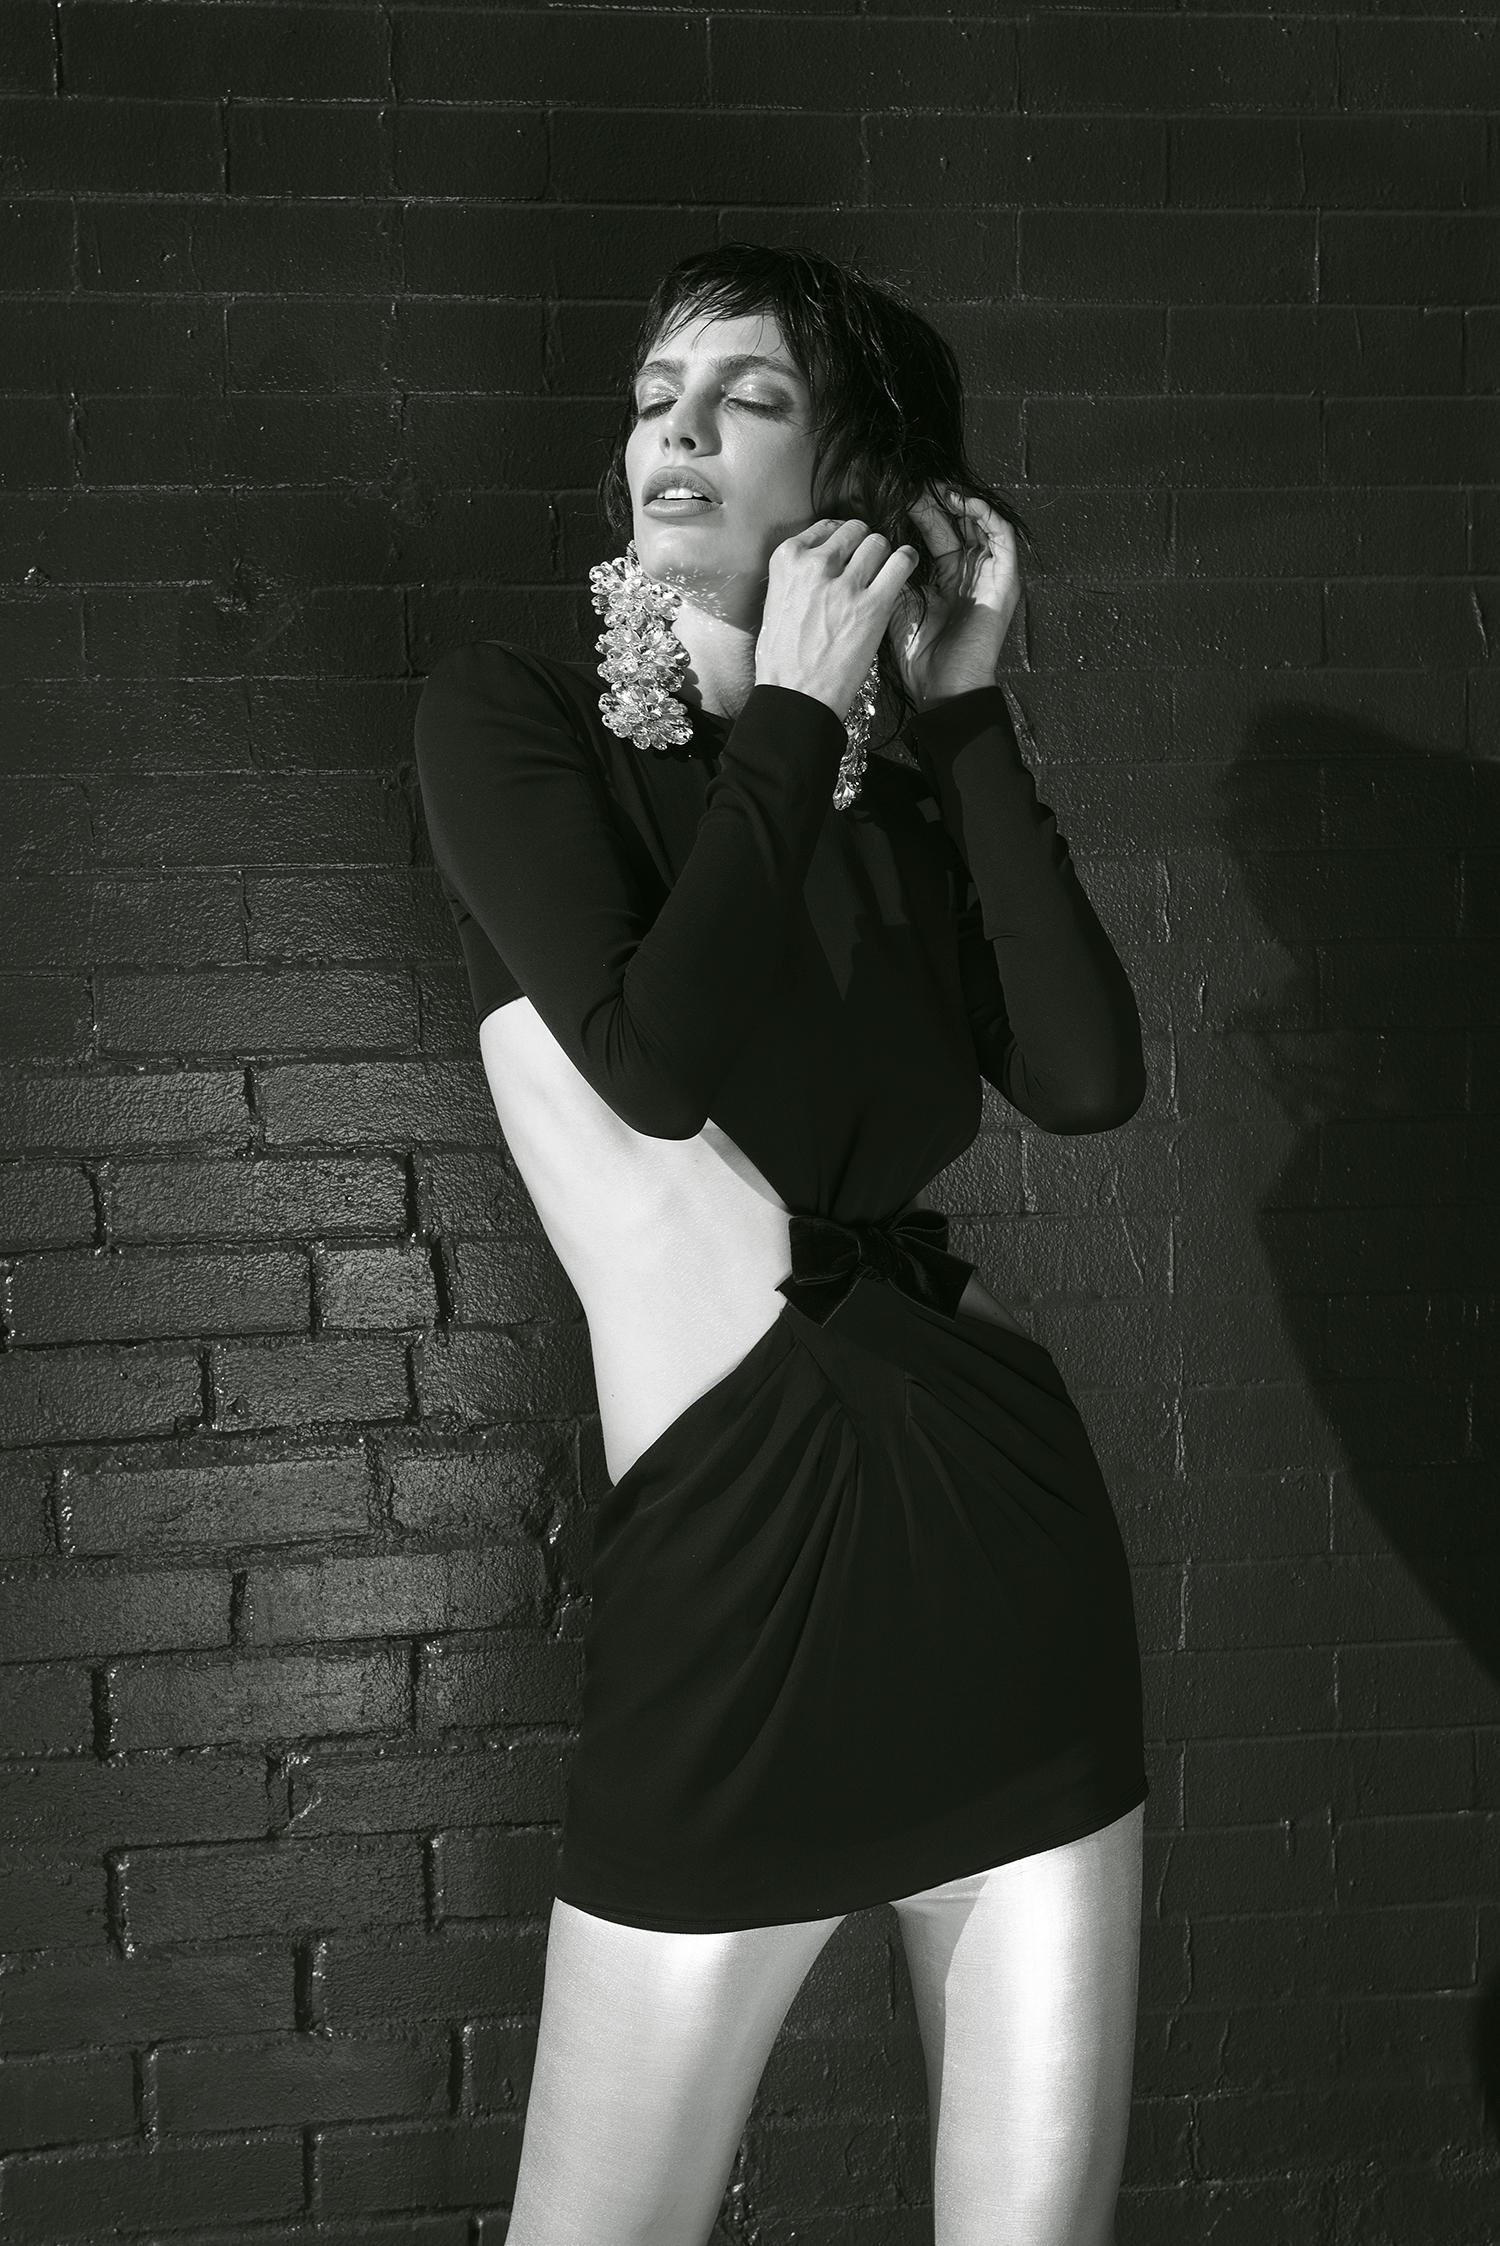 Mini vestido, leggings y aretes todo de Tom Ford, Saks Fifth Avenue.